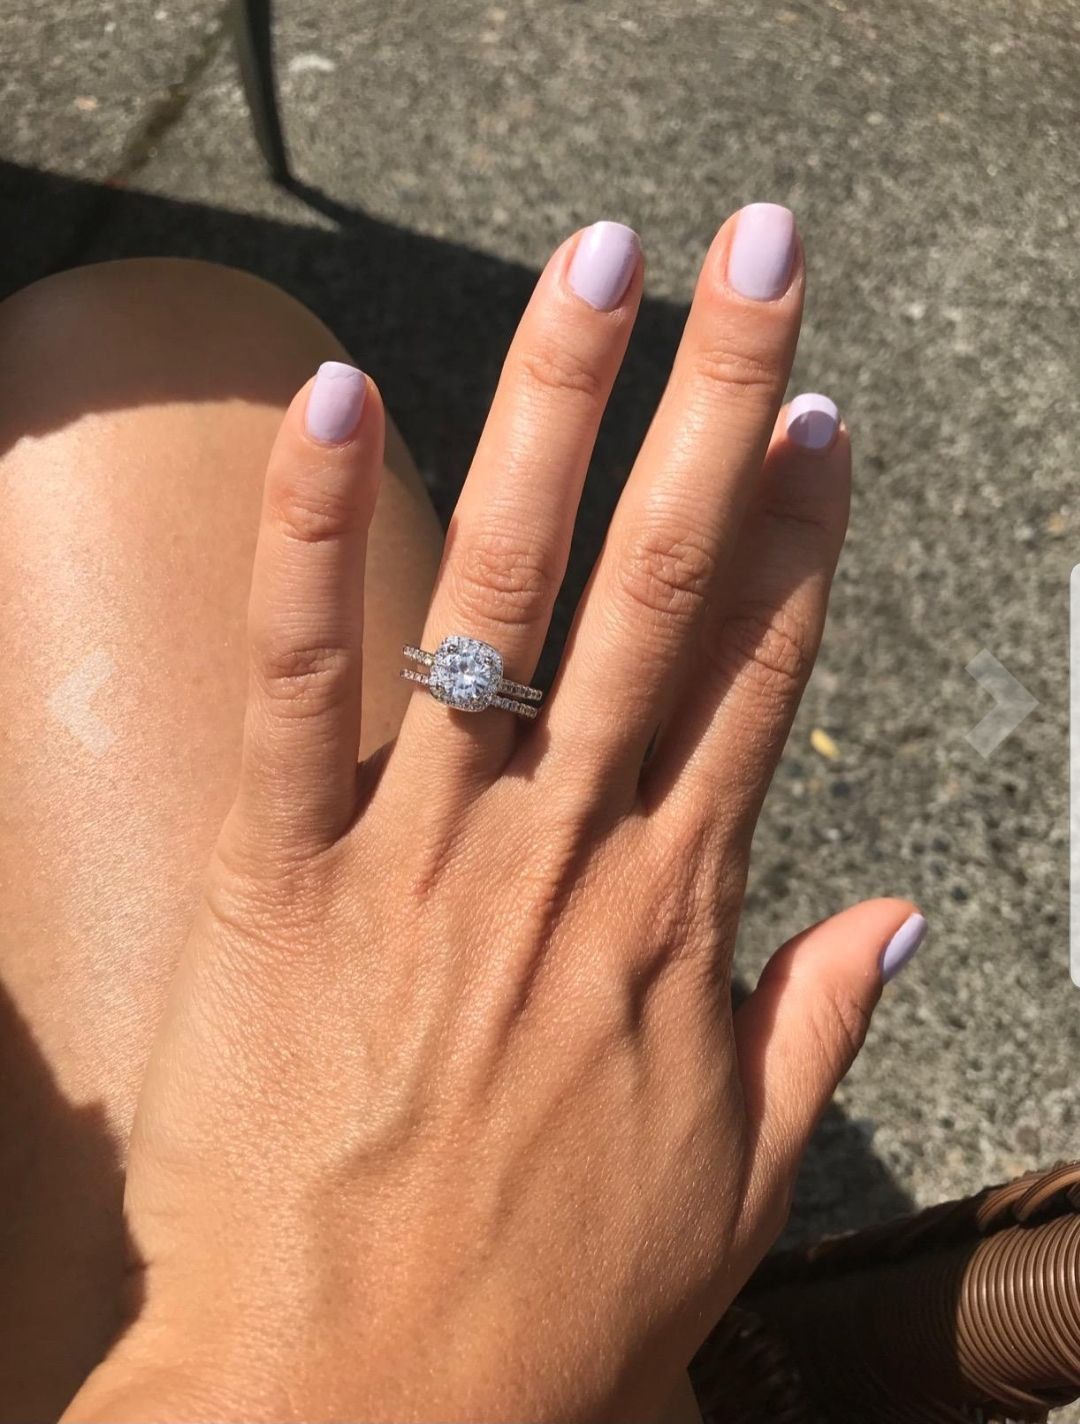 Silver rings 2 piece set. Very pretty! Just like pandora size 8.5 ...